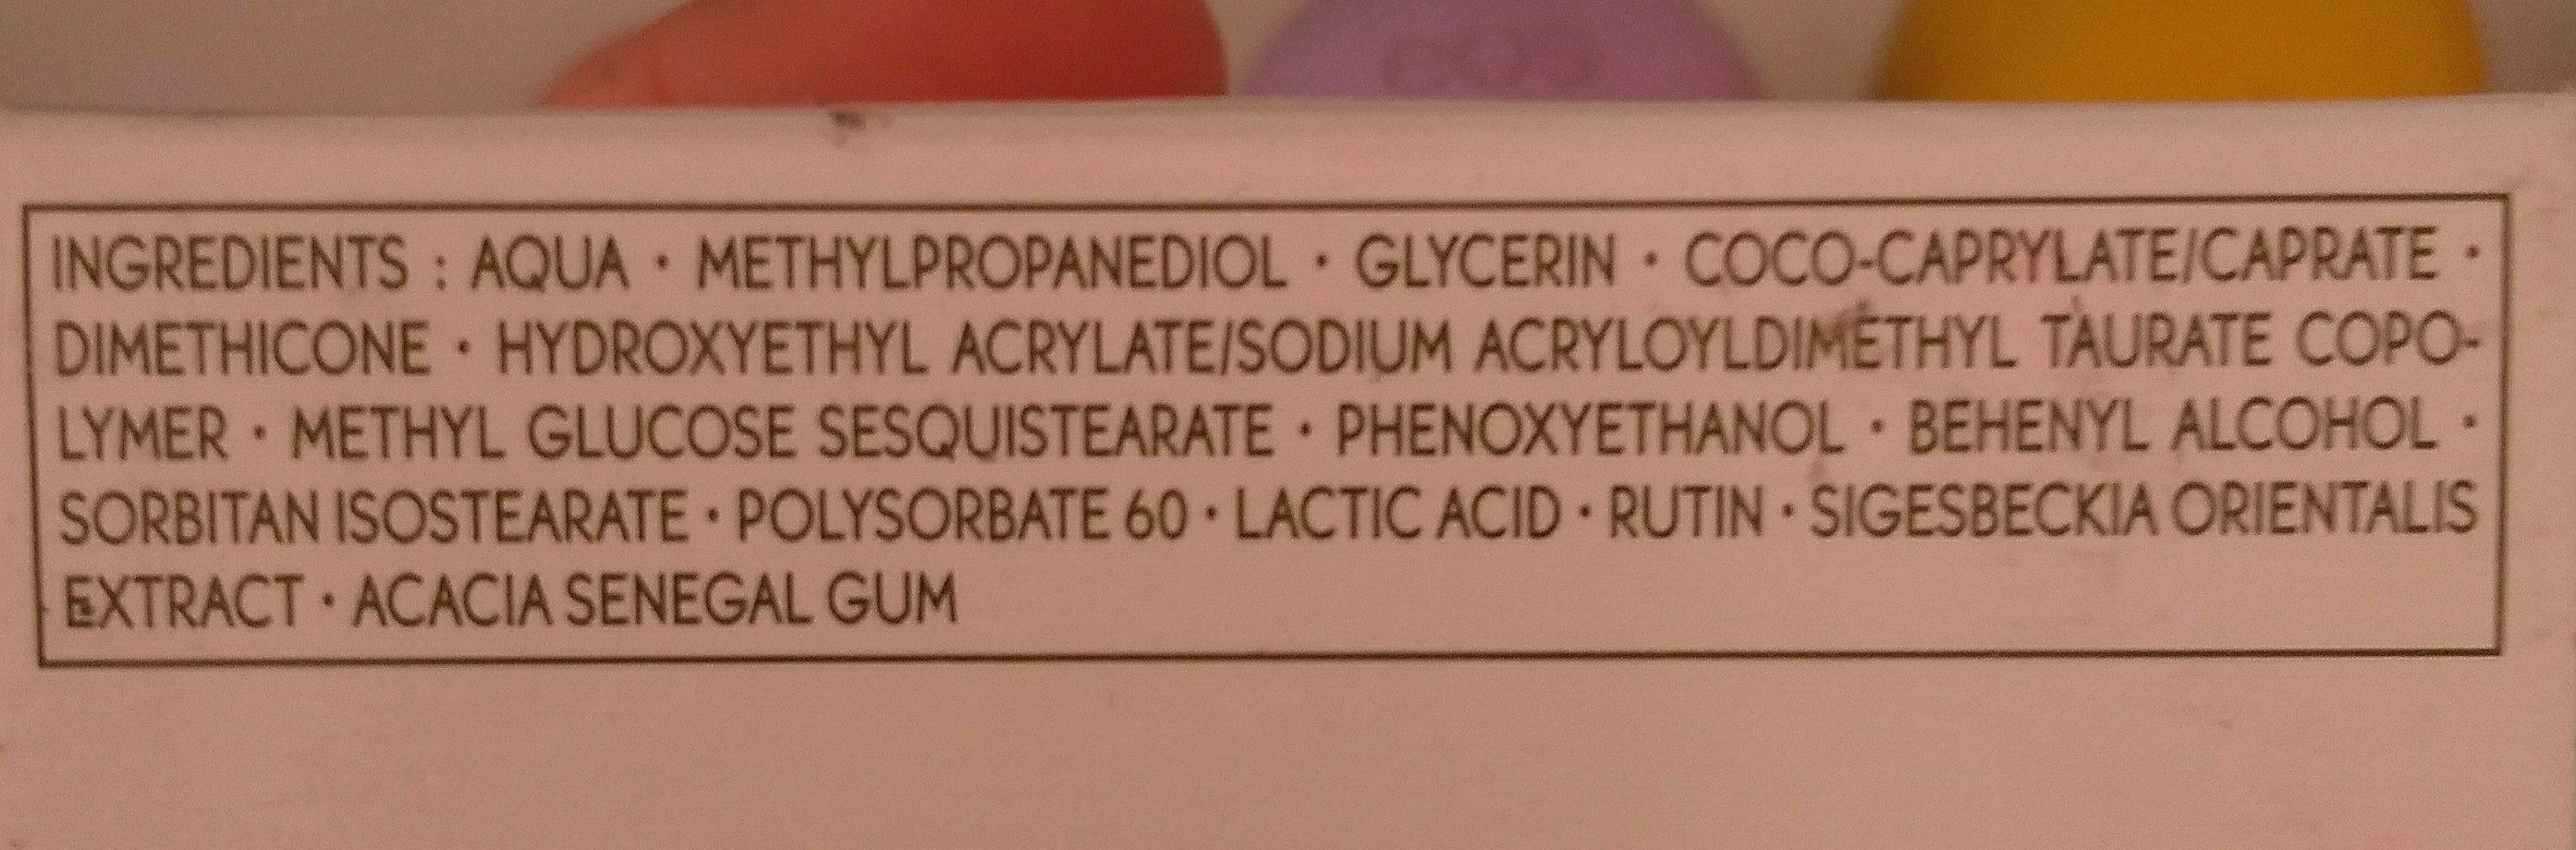 Sensitive Vegetal Creme - Ingredients - fr